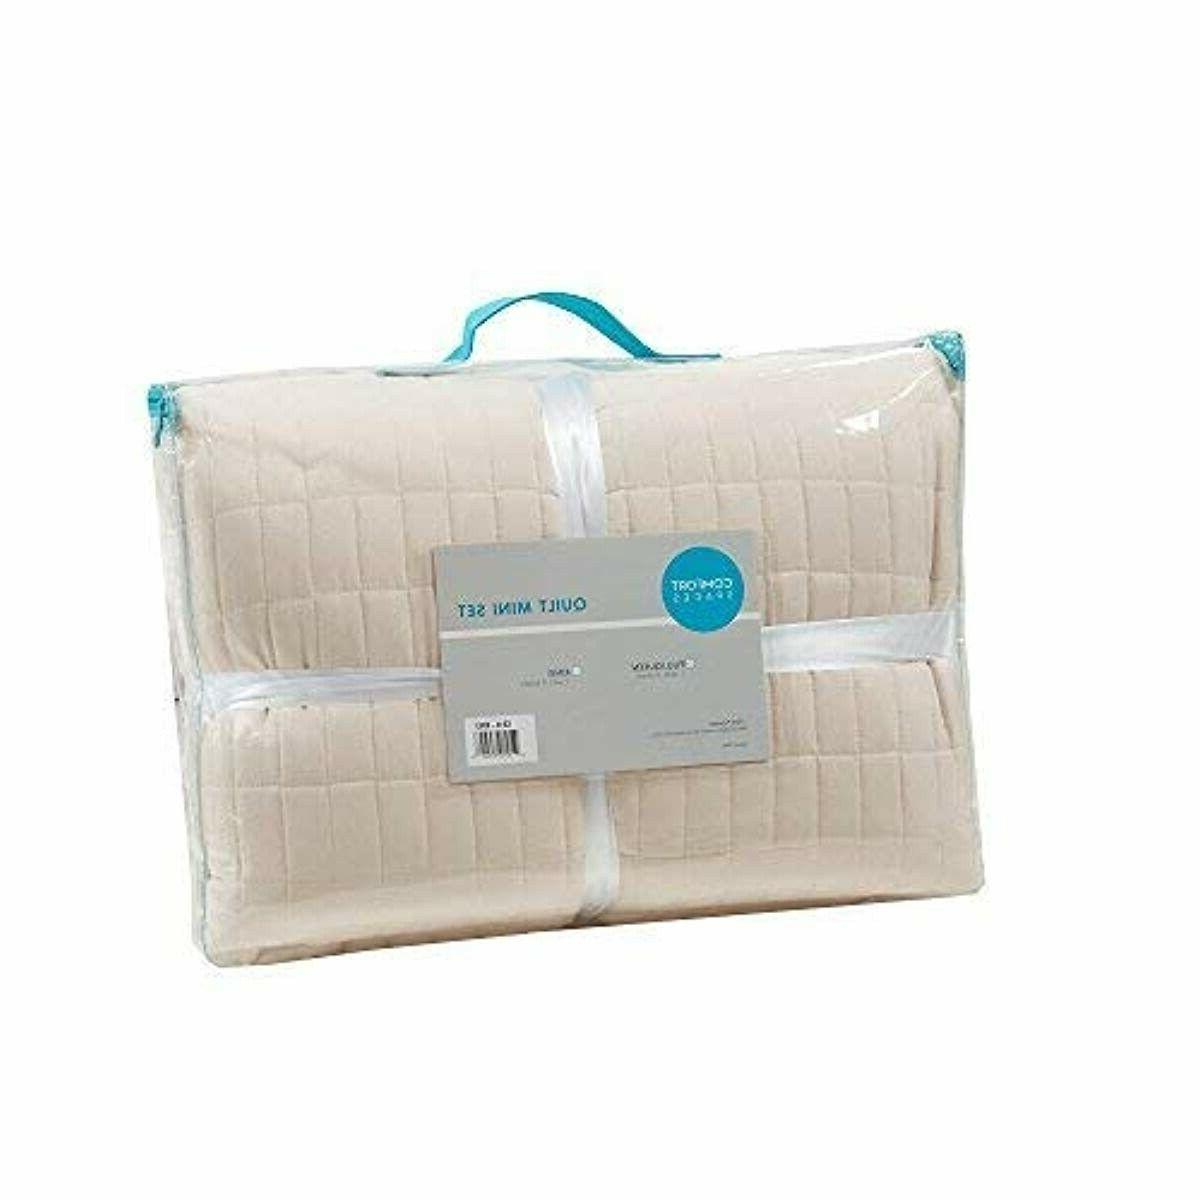 Comfort Spaces - Kienna Quilt 3 Piece Ivory -